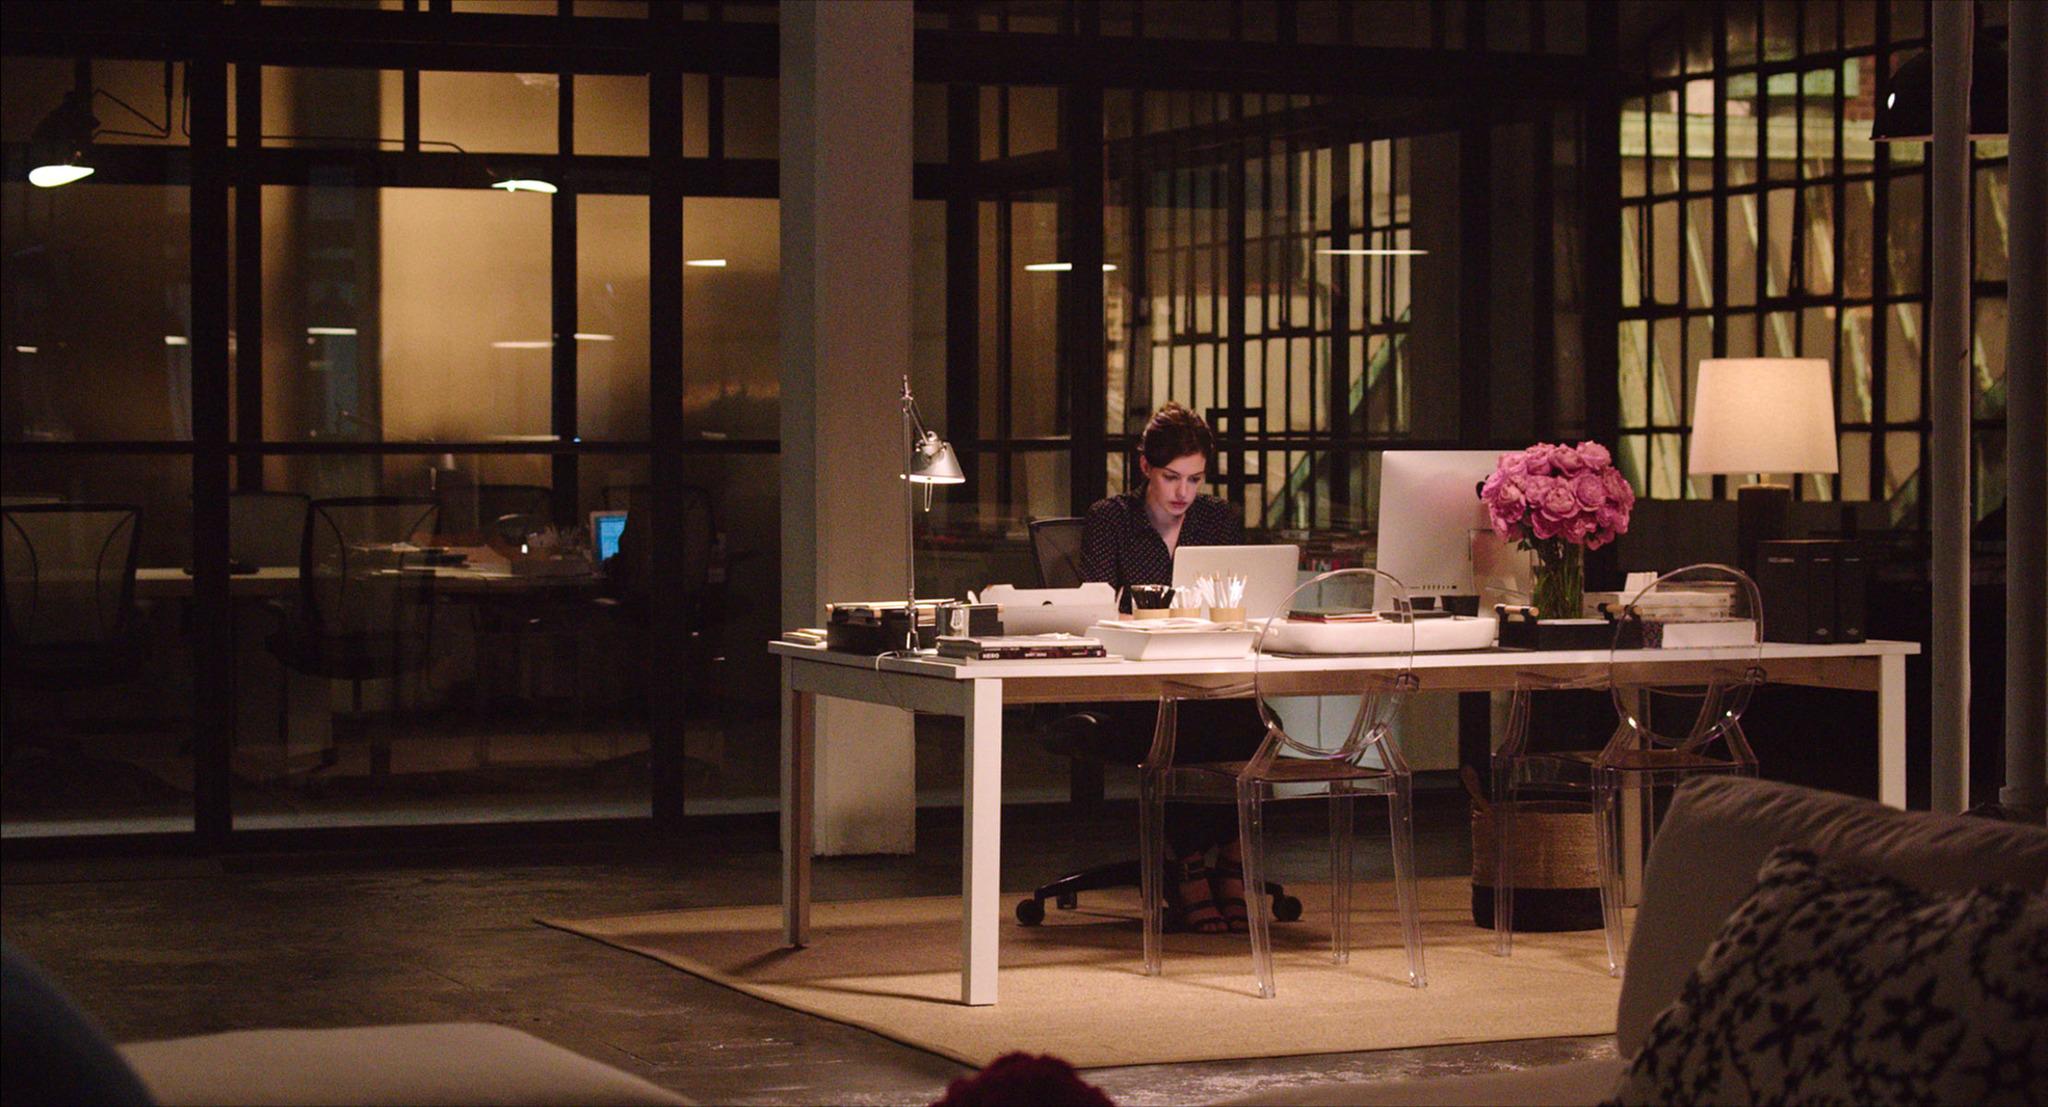 Anne Hathaway in The Intern (2015)